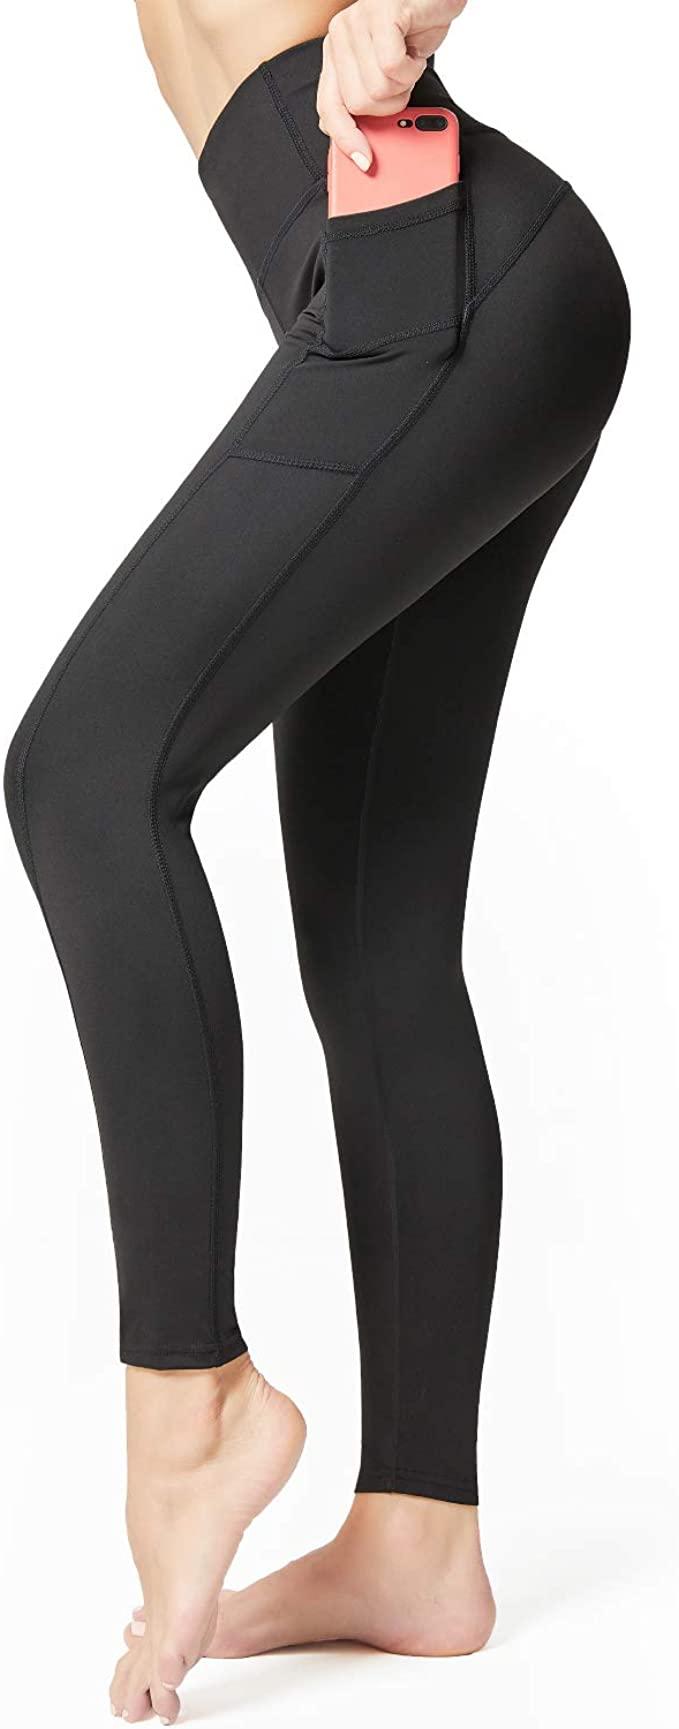 Yoga Tight Capris Pants - WF Shopping